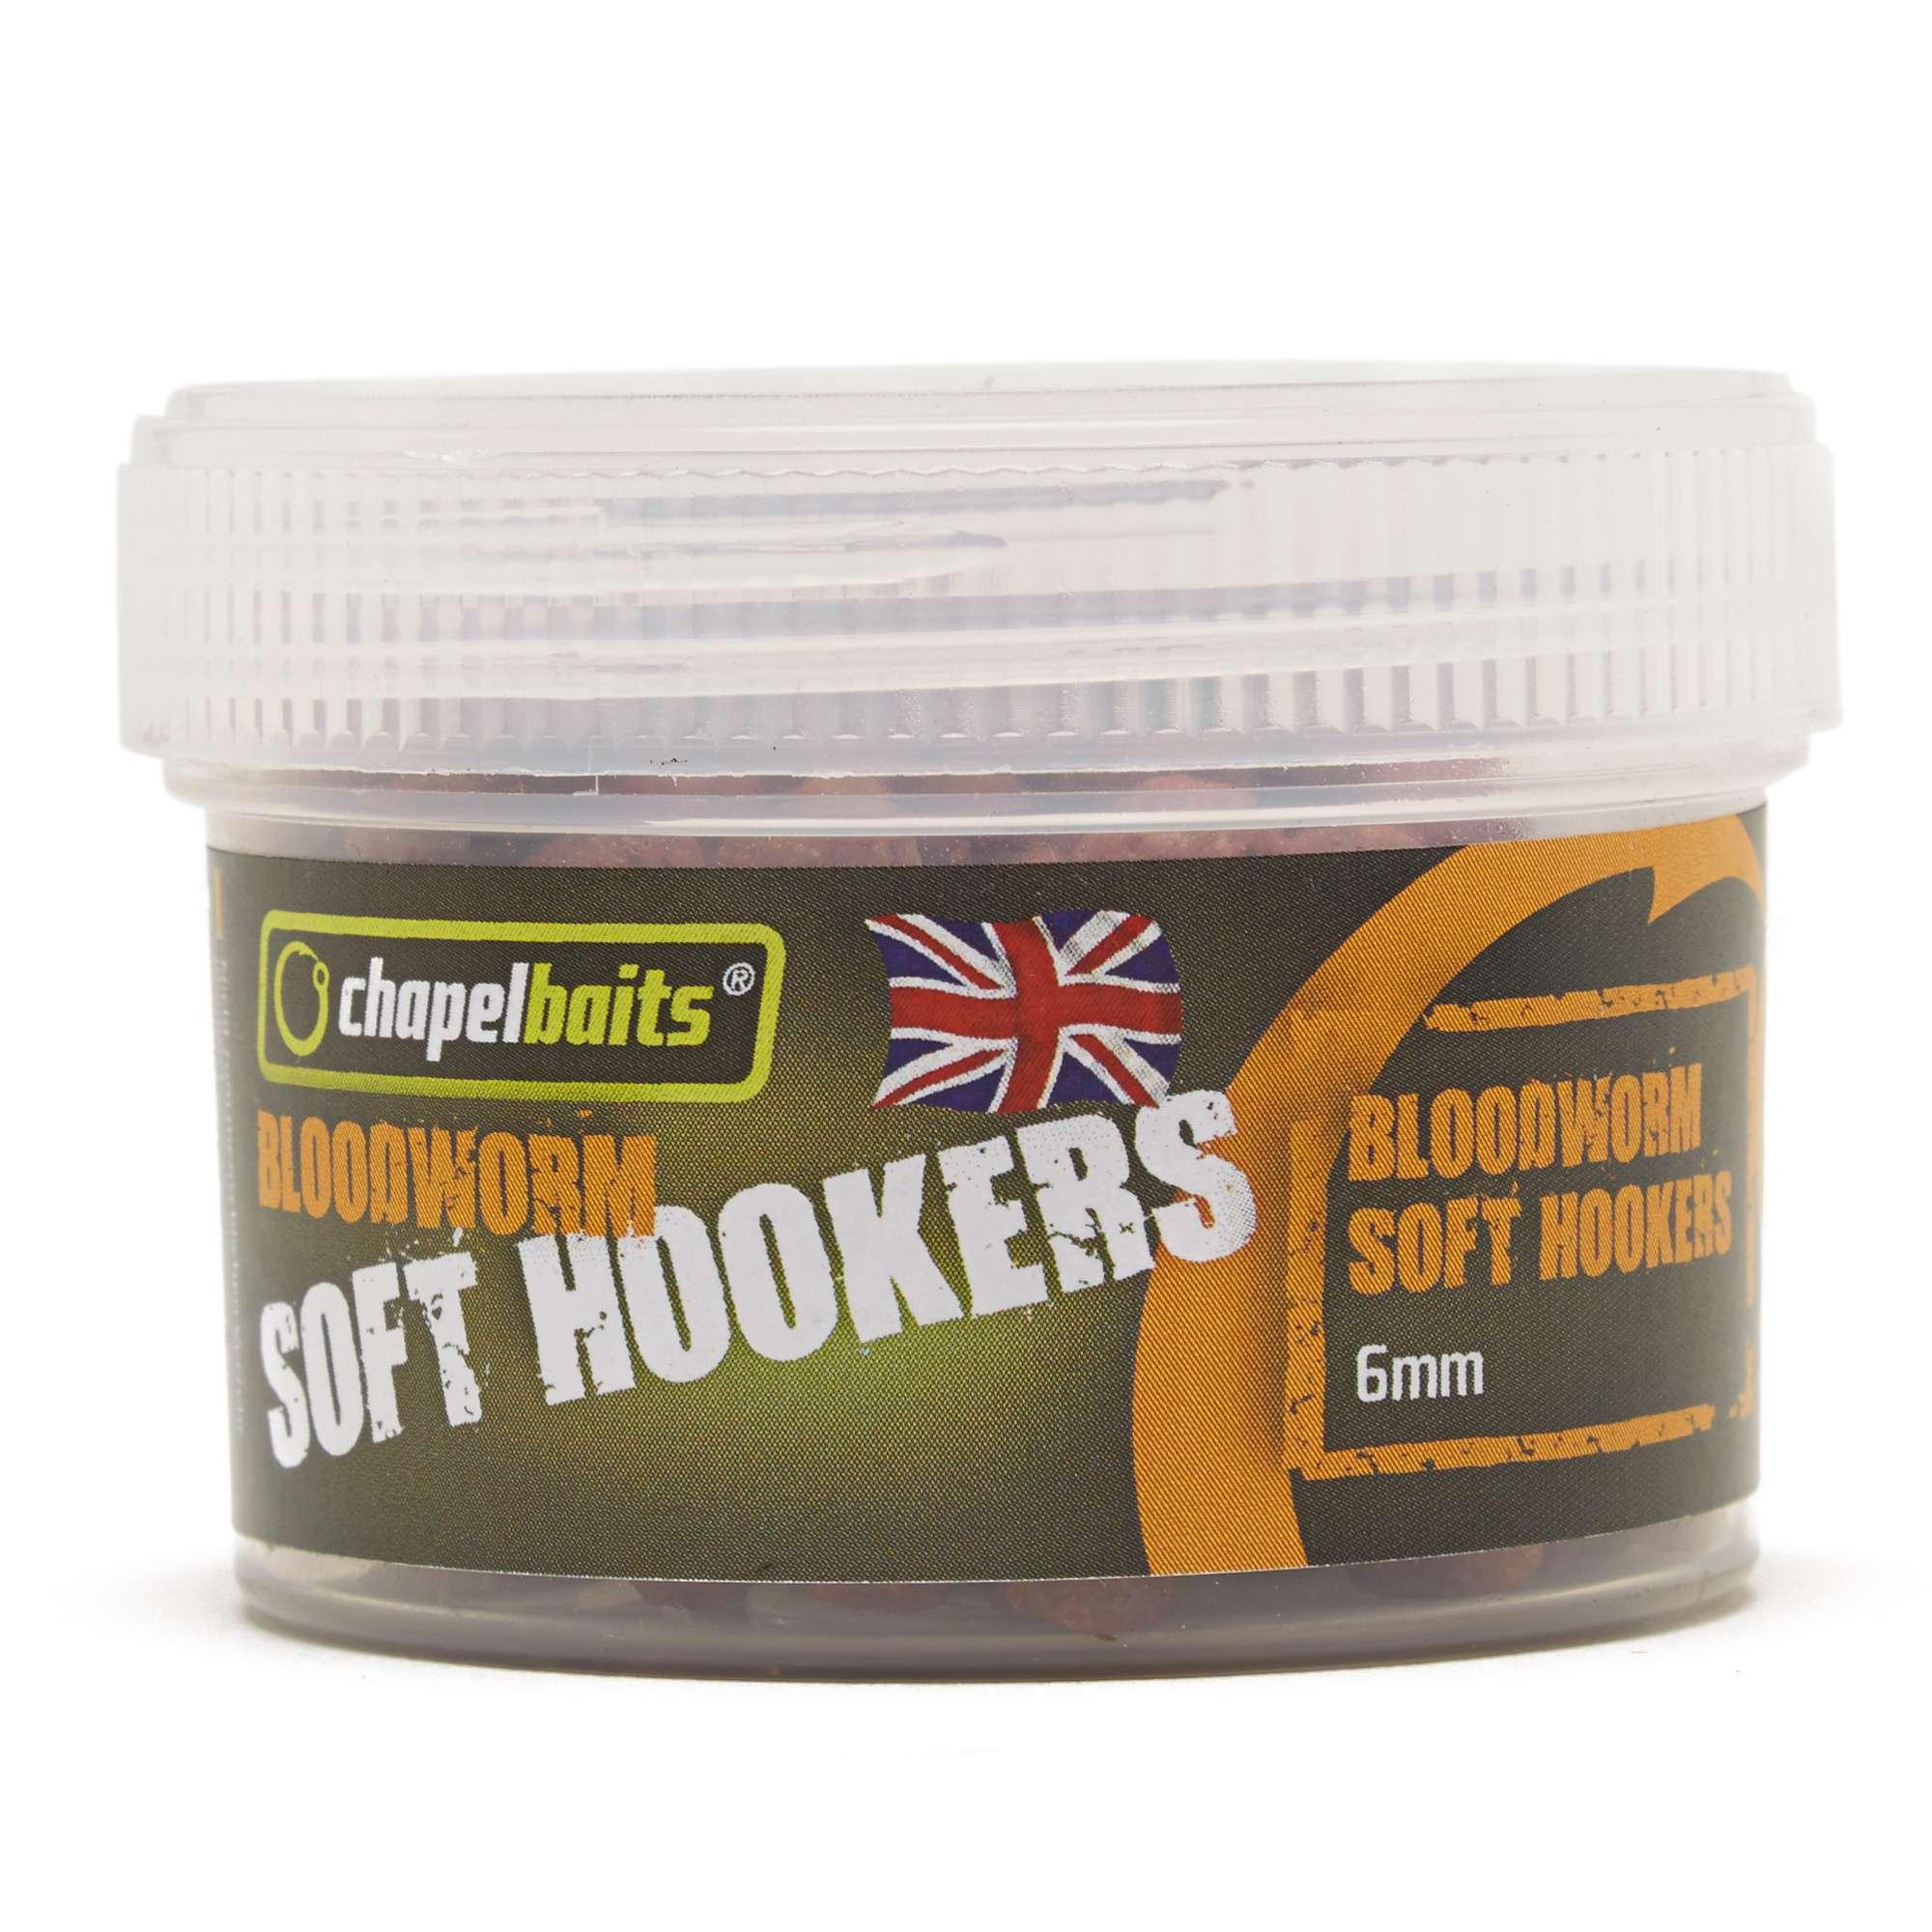 CHAPEL BAITS 6mm Soft Hooker Pellets, Bloodworm